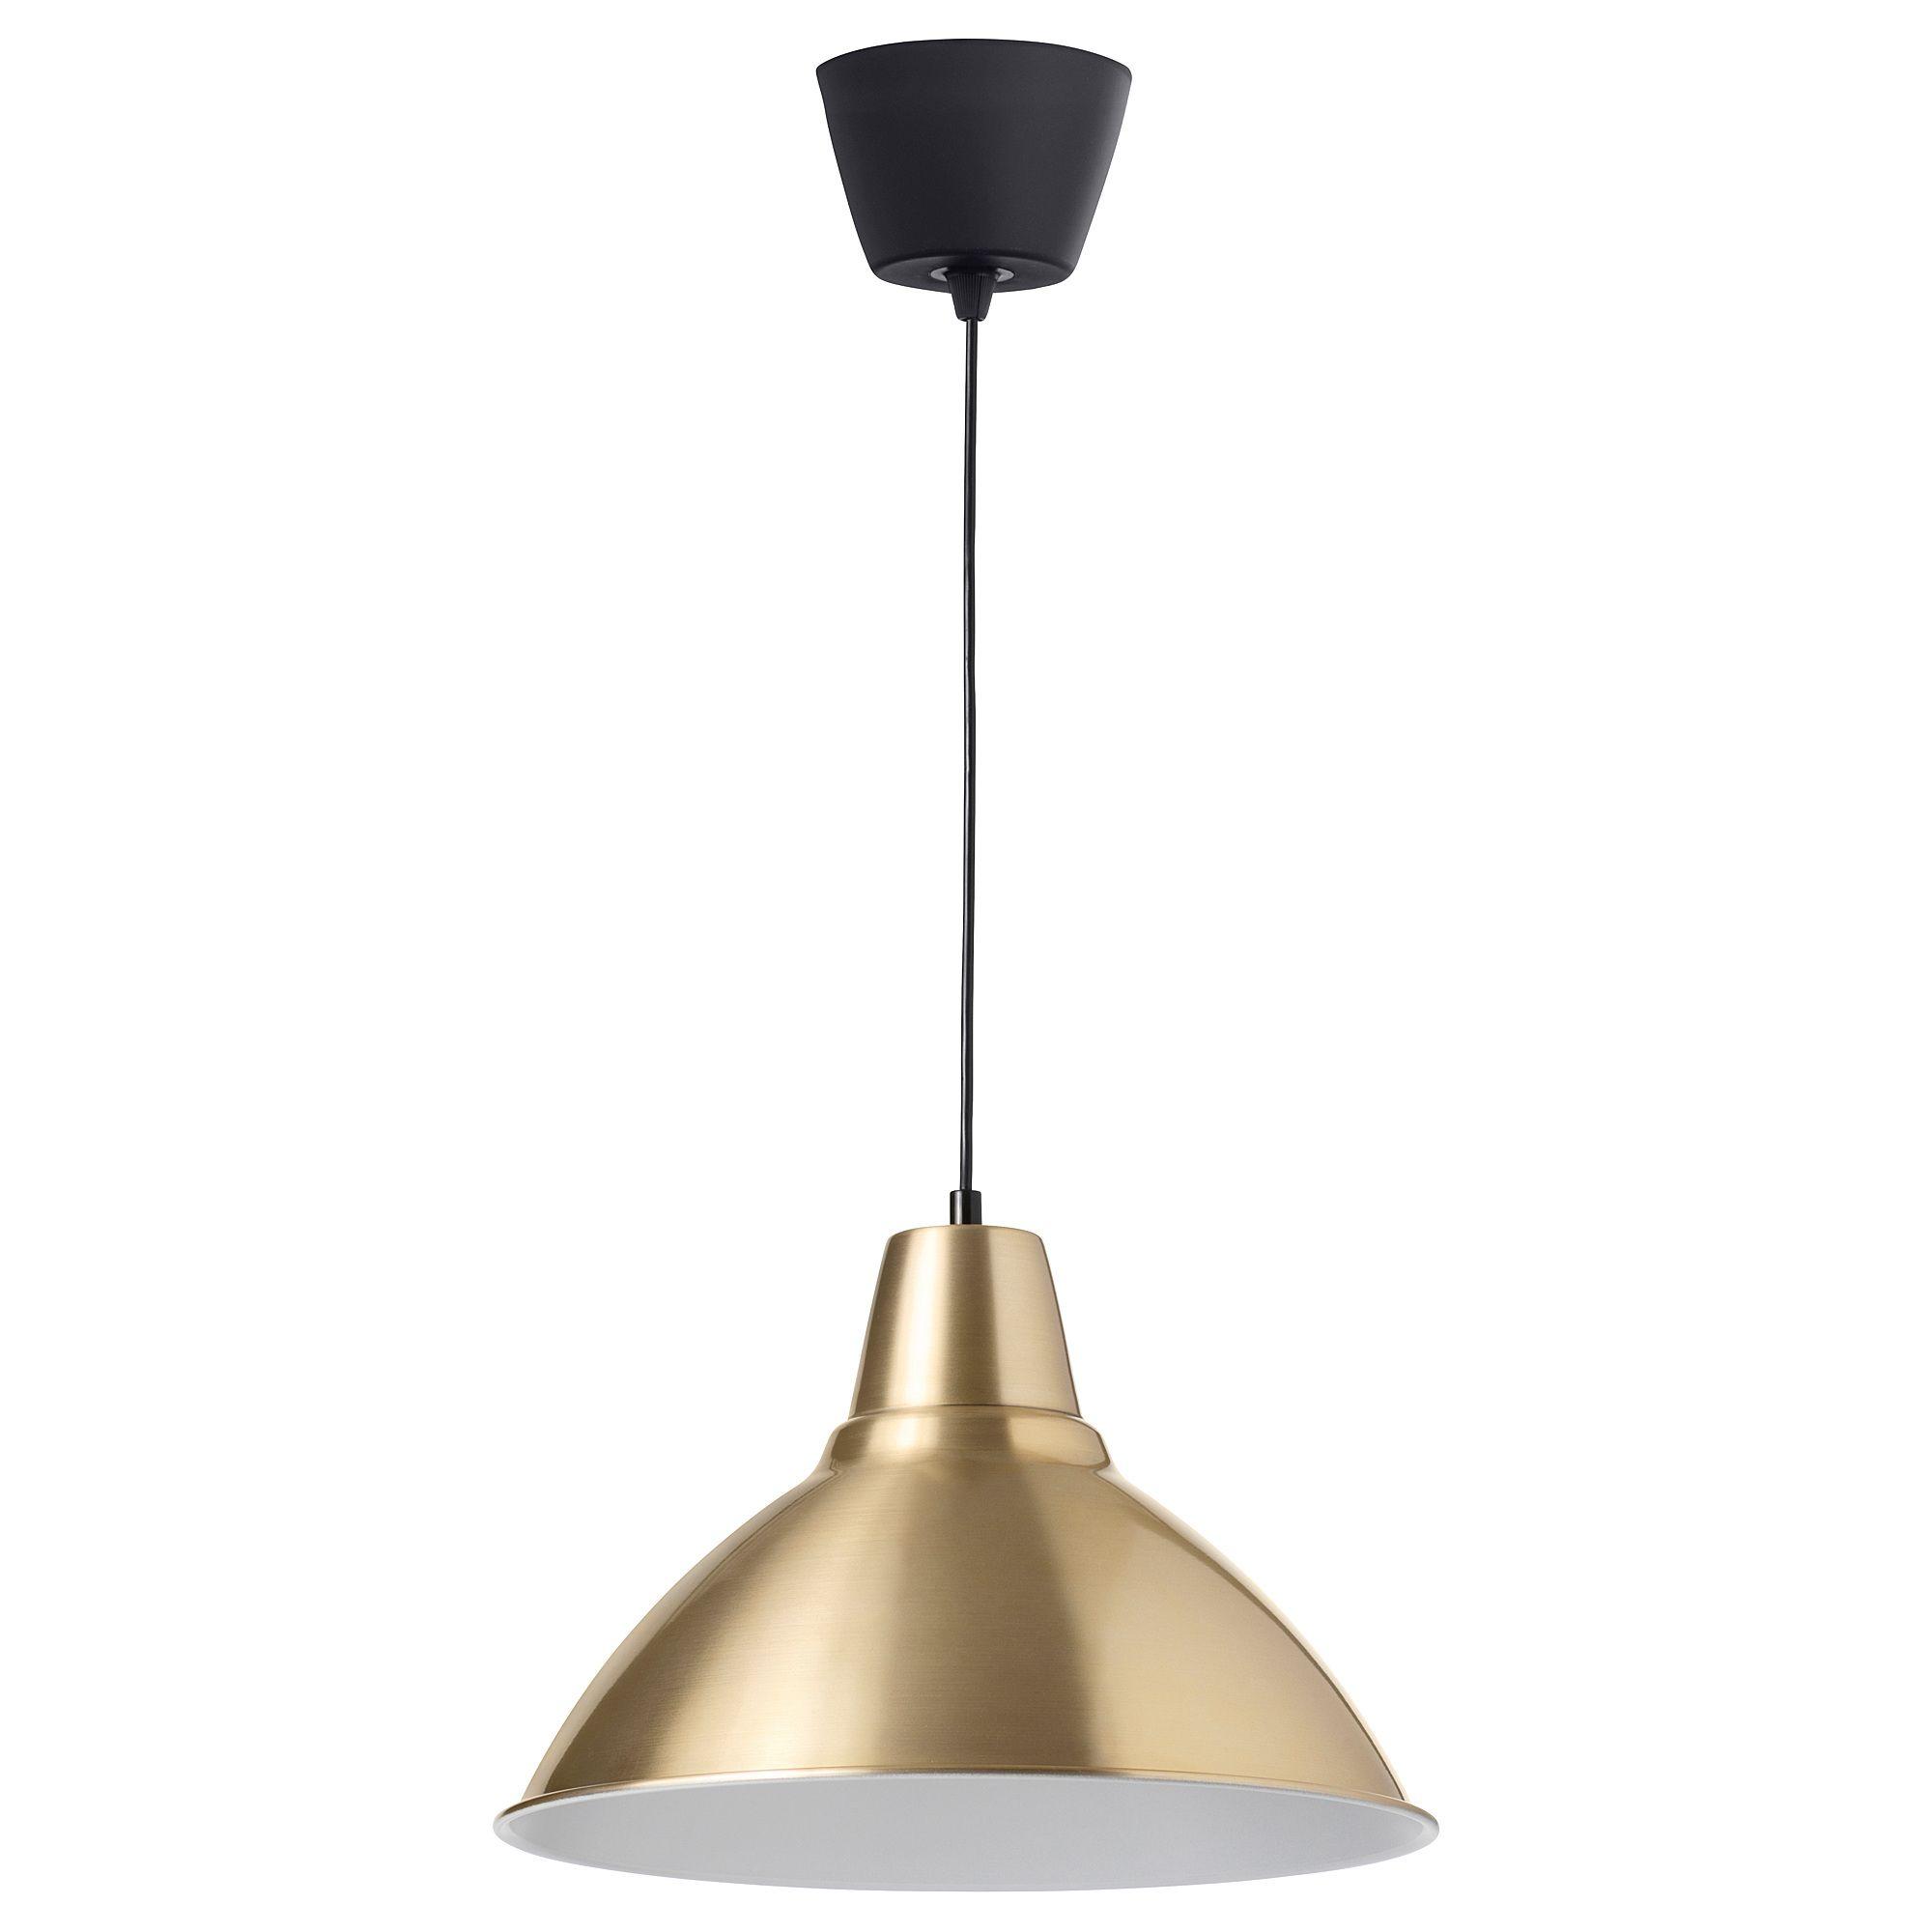 FOTO φωτιστικό οροφής IKEA   Pendant lamp, Brass pendant